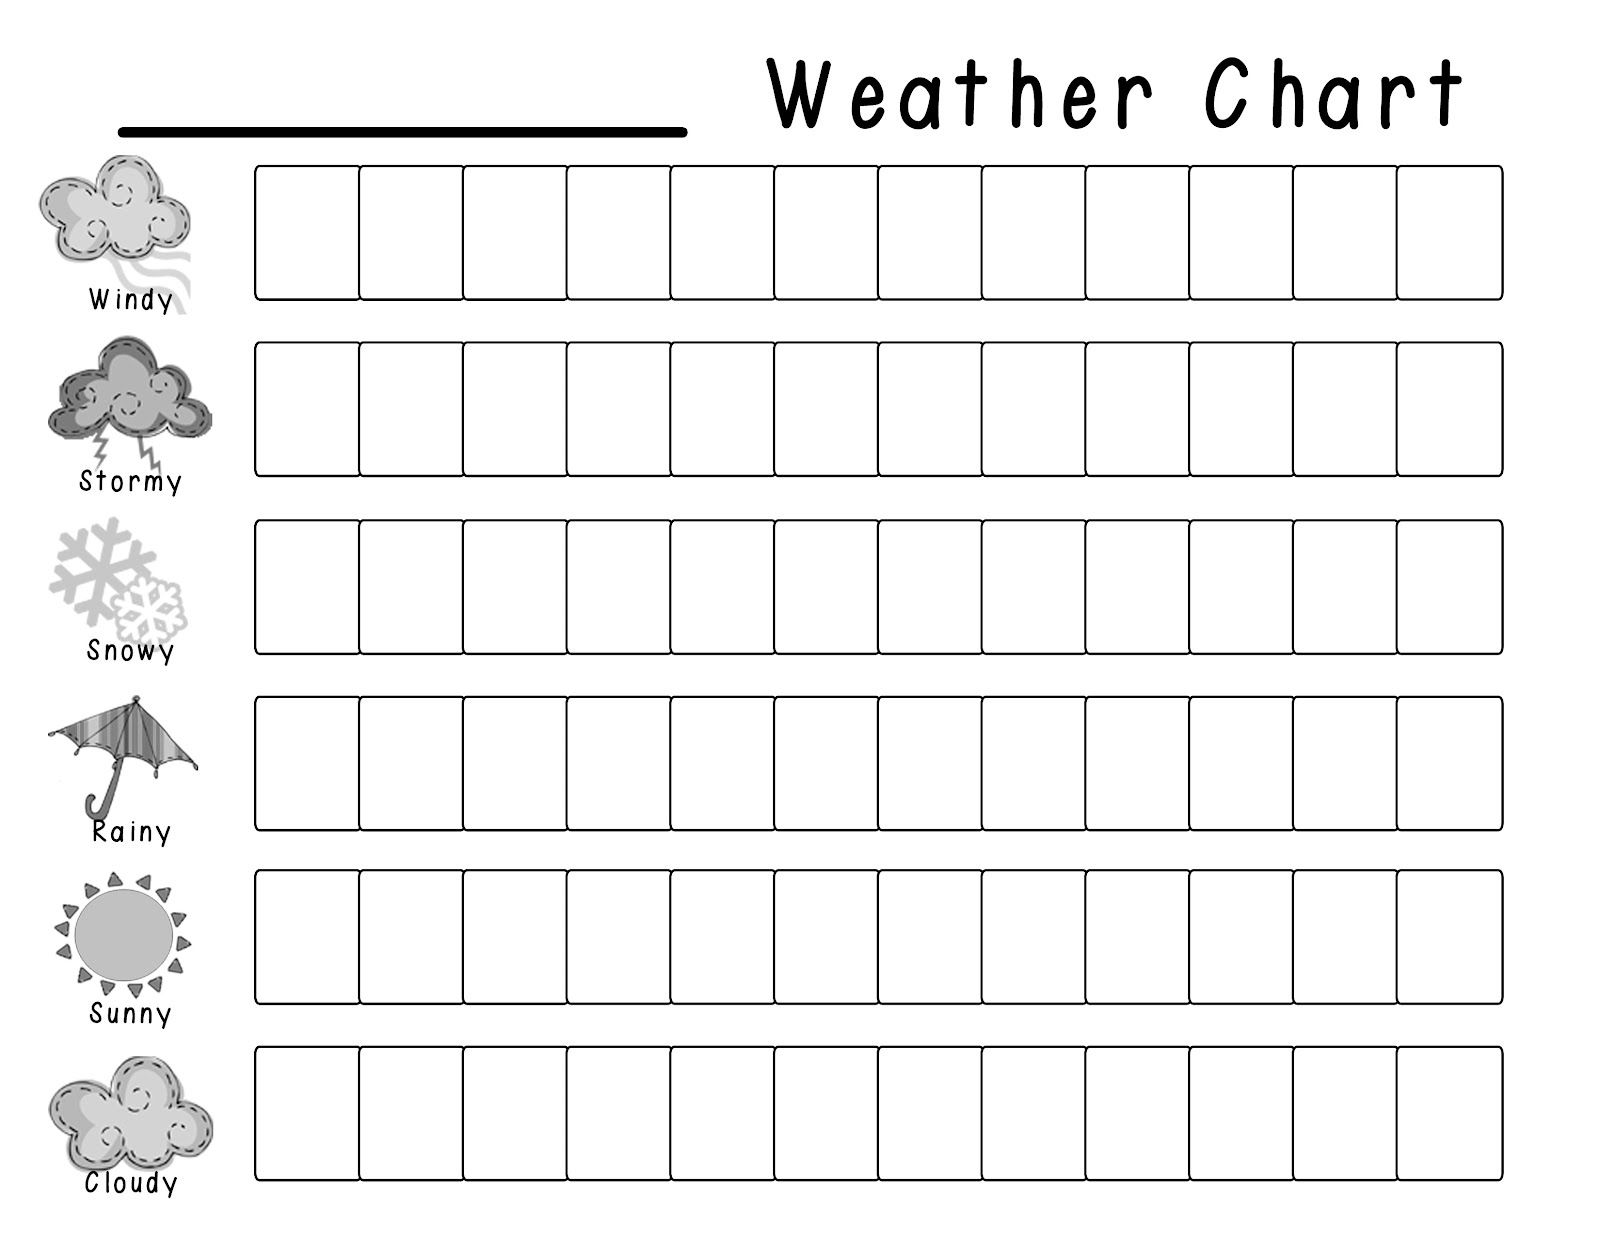 Weather Chart Copy Jpg Google Drive Preschool Weather Weather Chart Preschool Weather Chart [ 1236 x 1600 Pixel ]